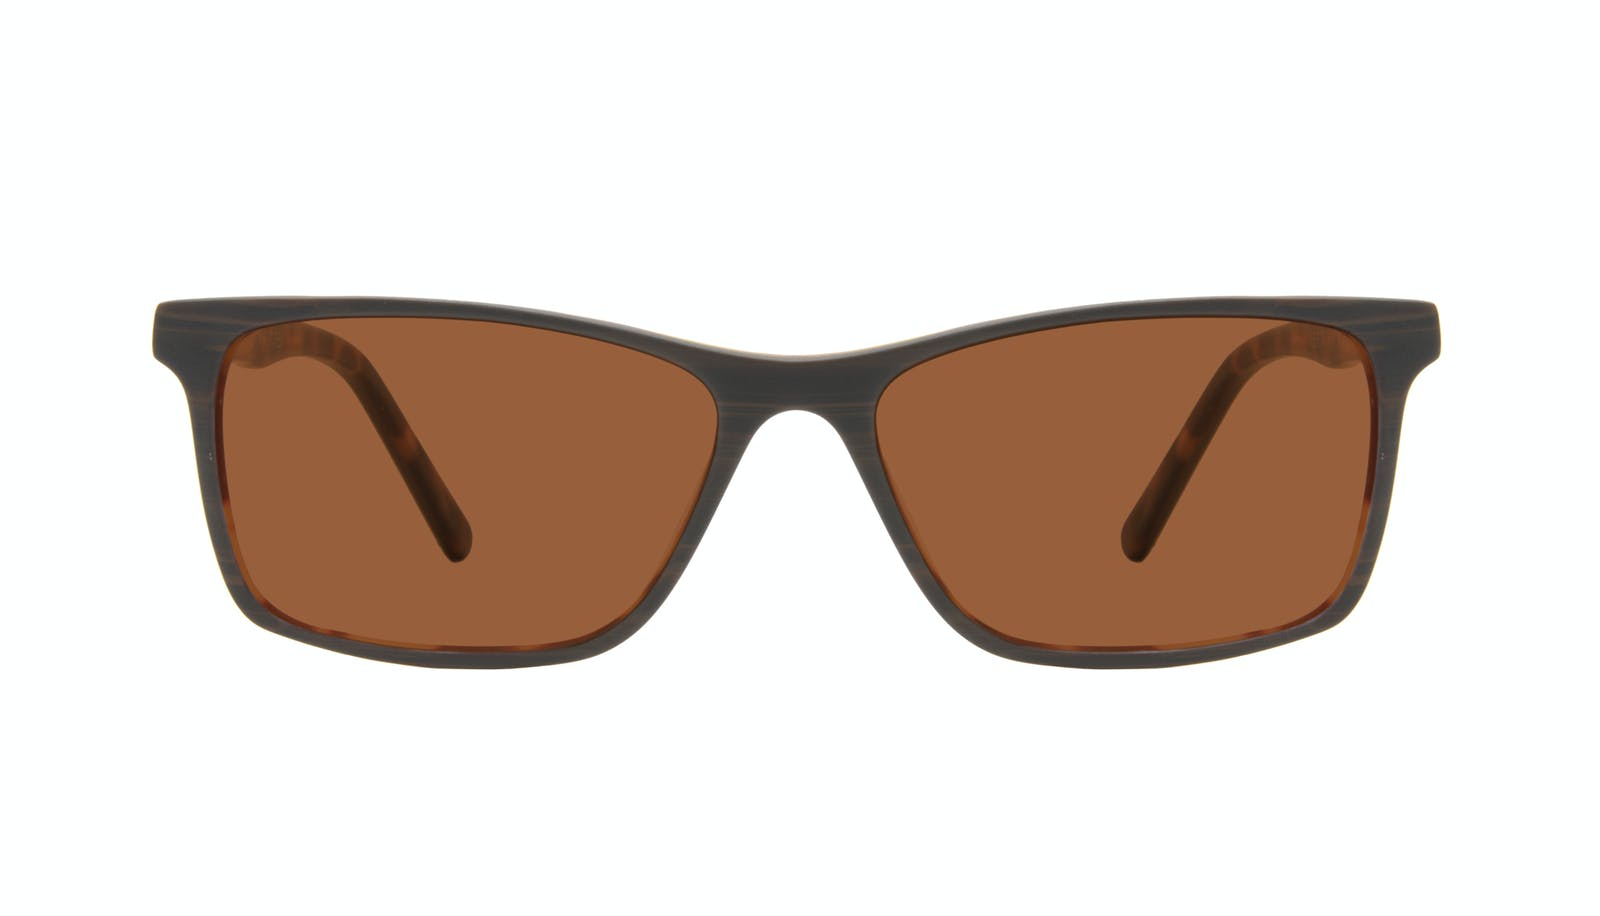 3f561ceeda0 Affordable Fashion Glasses Rectangle Sunglasses Men Henri Brown Stripes